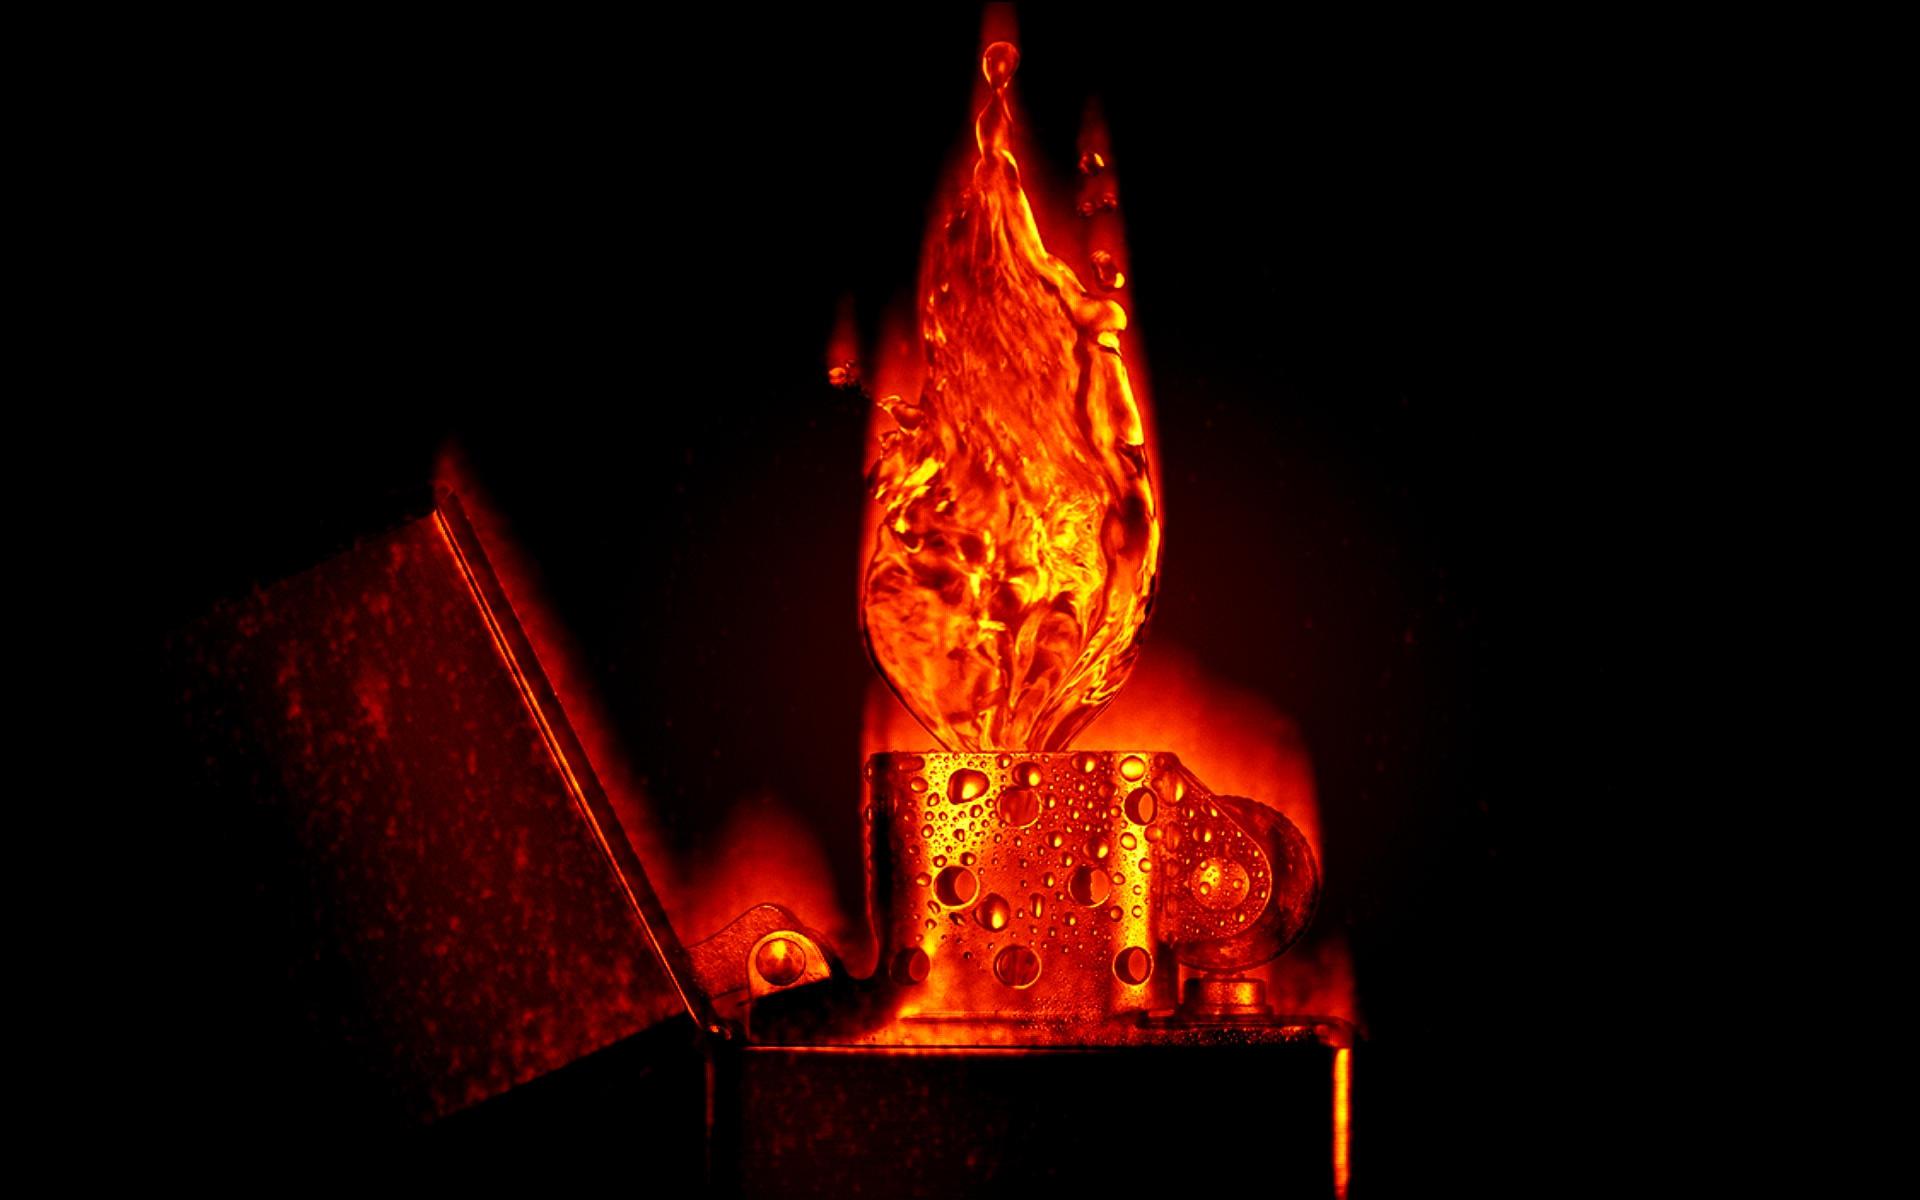 burning water screensaver by chlorgas on deviantart